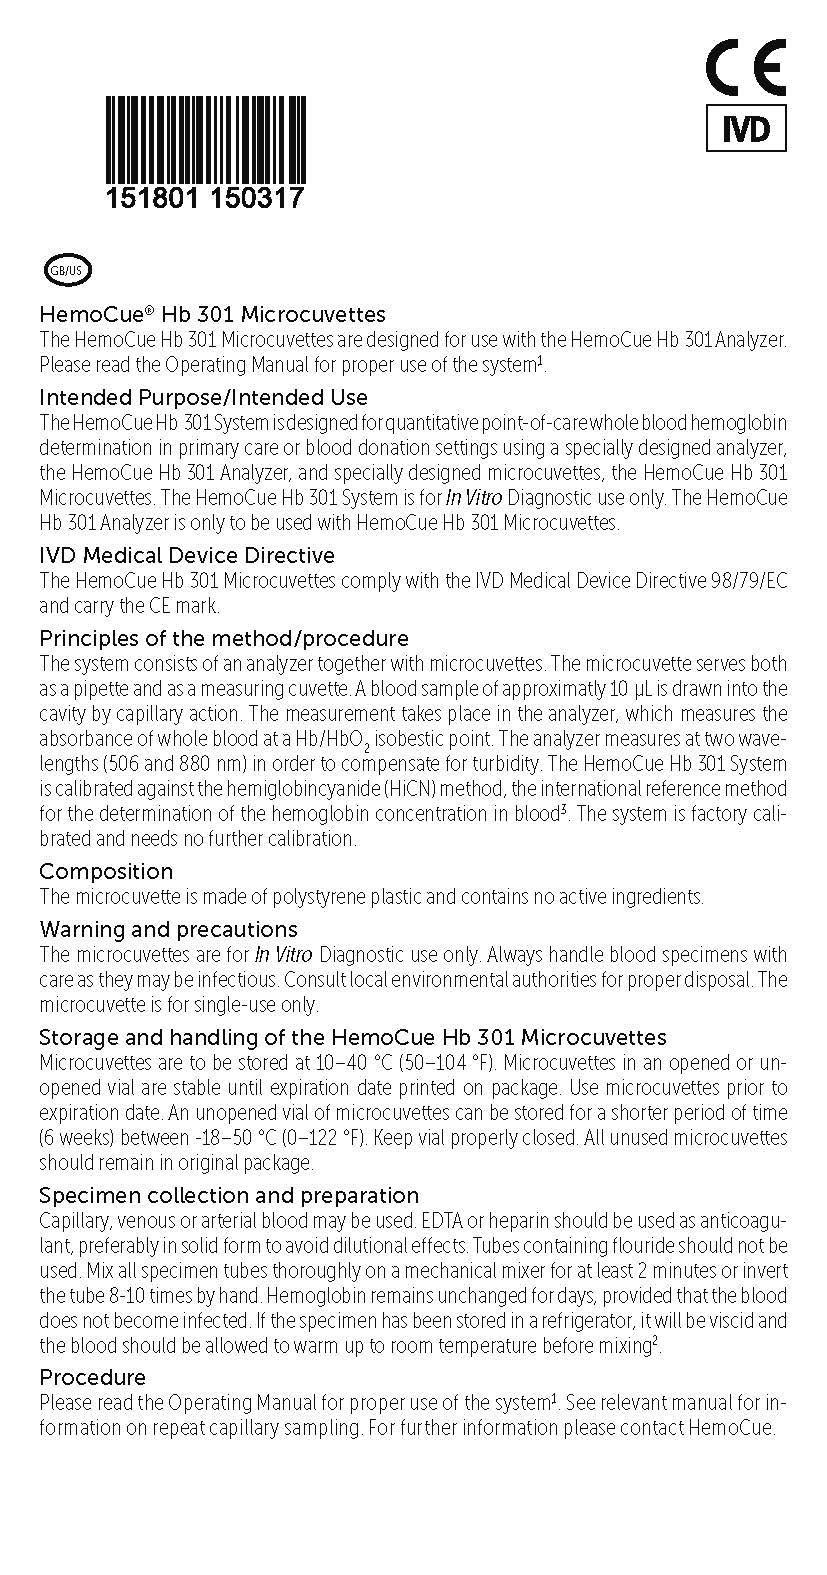 HemoCue Hb 301 Product insert